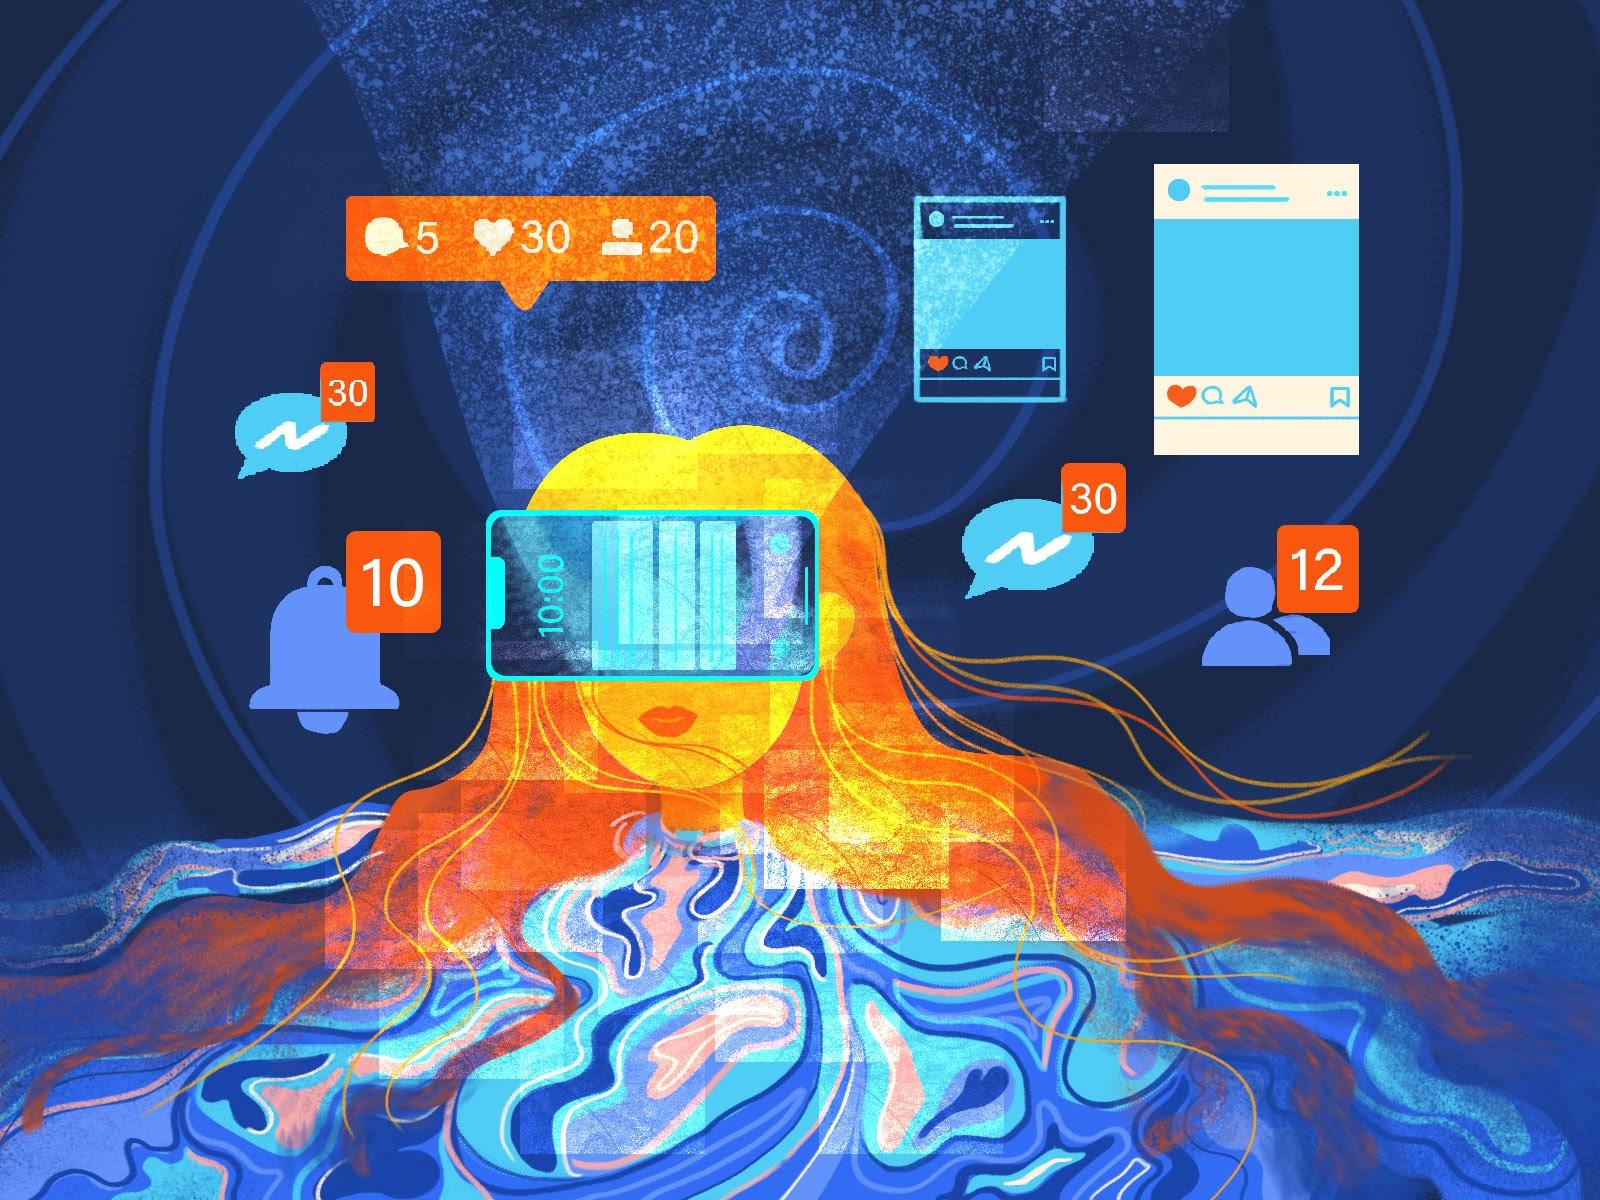 lost, social media, addiction, phone distractions